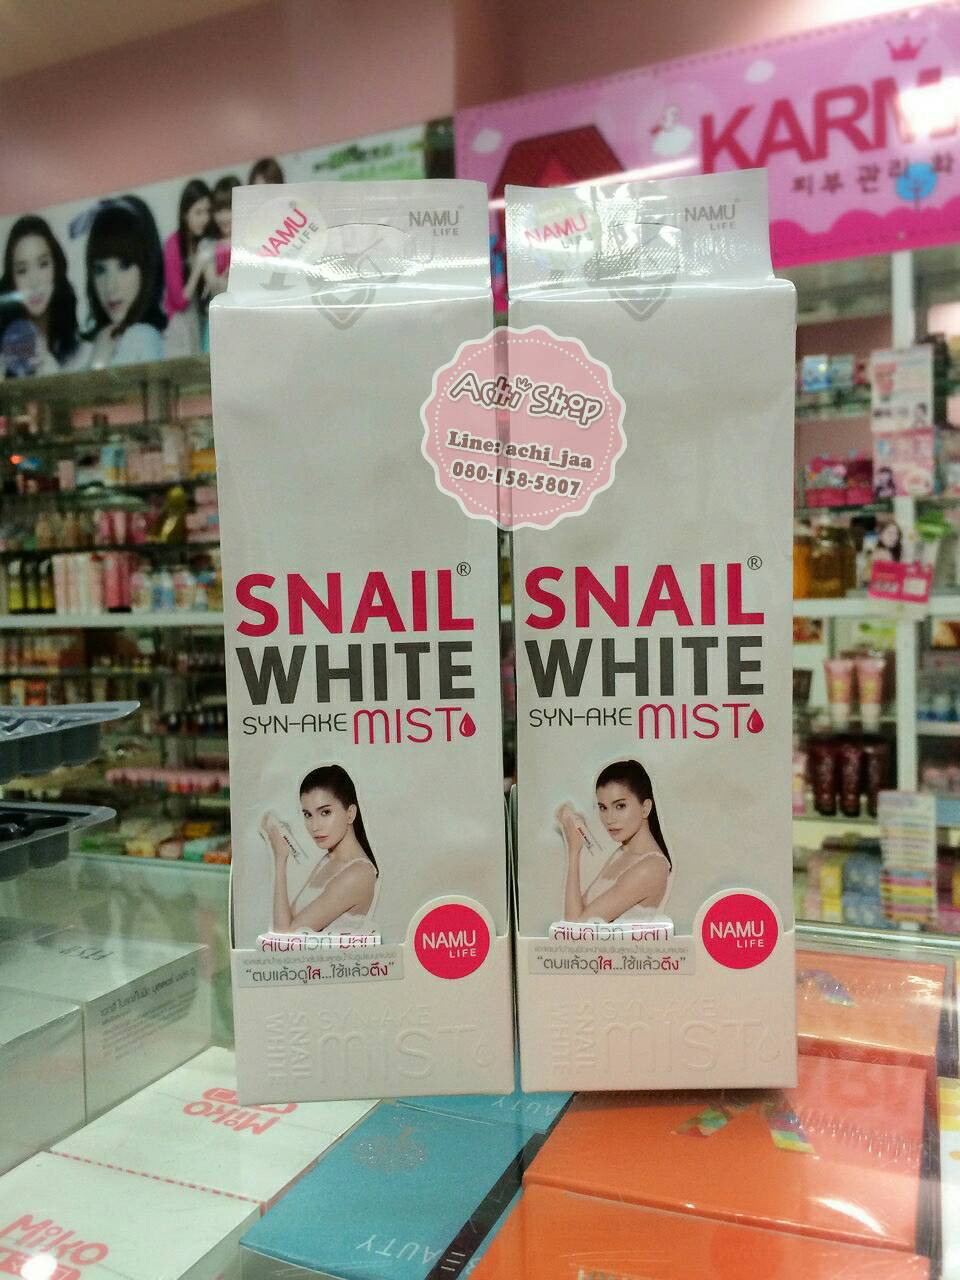 snail white syn-ake mist สเนลไวท์ ซิน-เอค มิสท์ 2 กล่อง